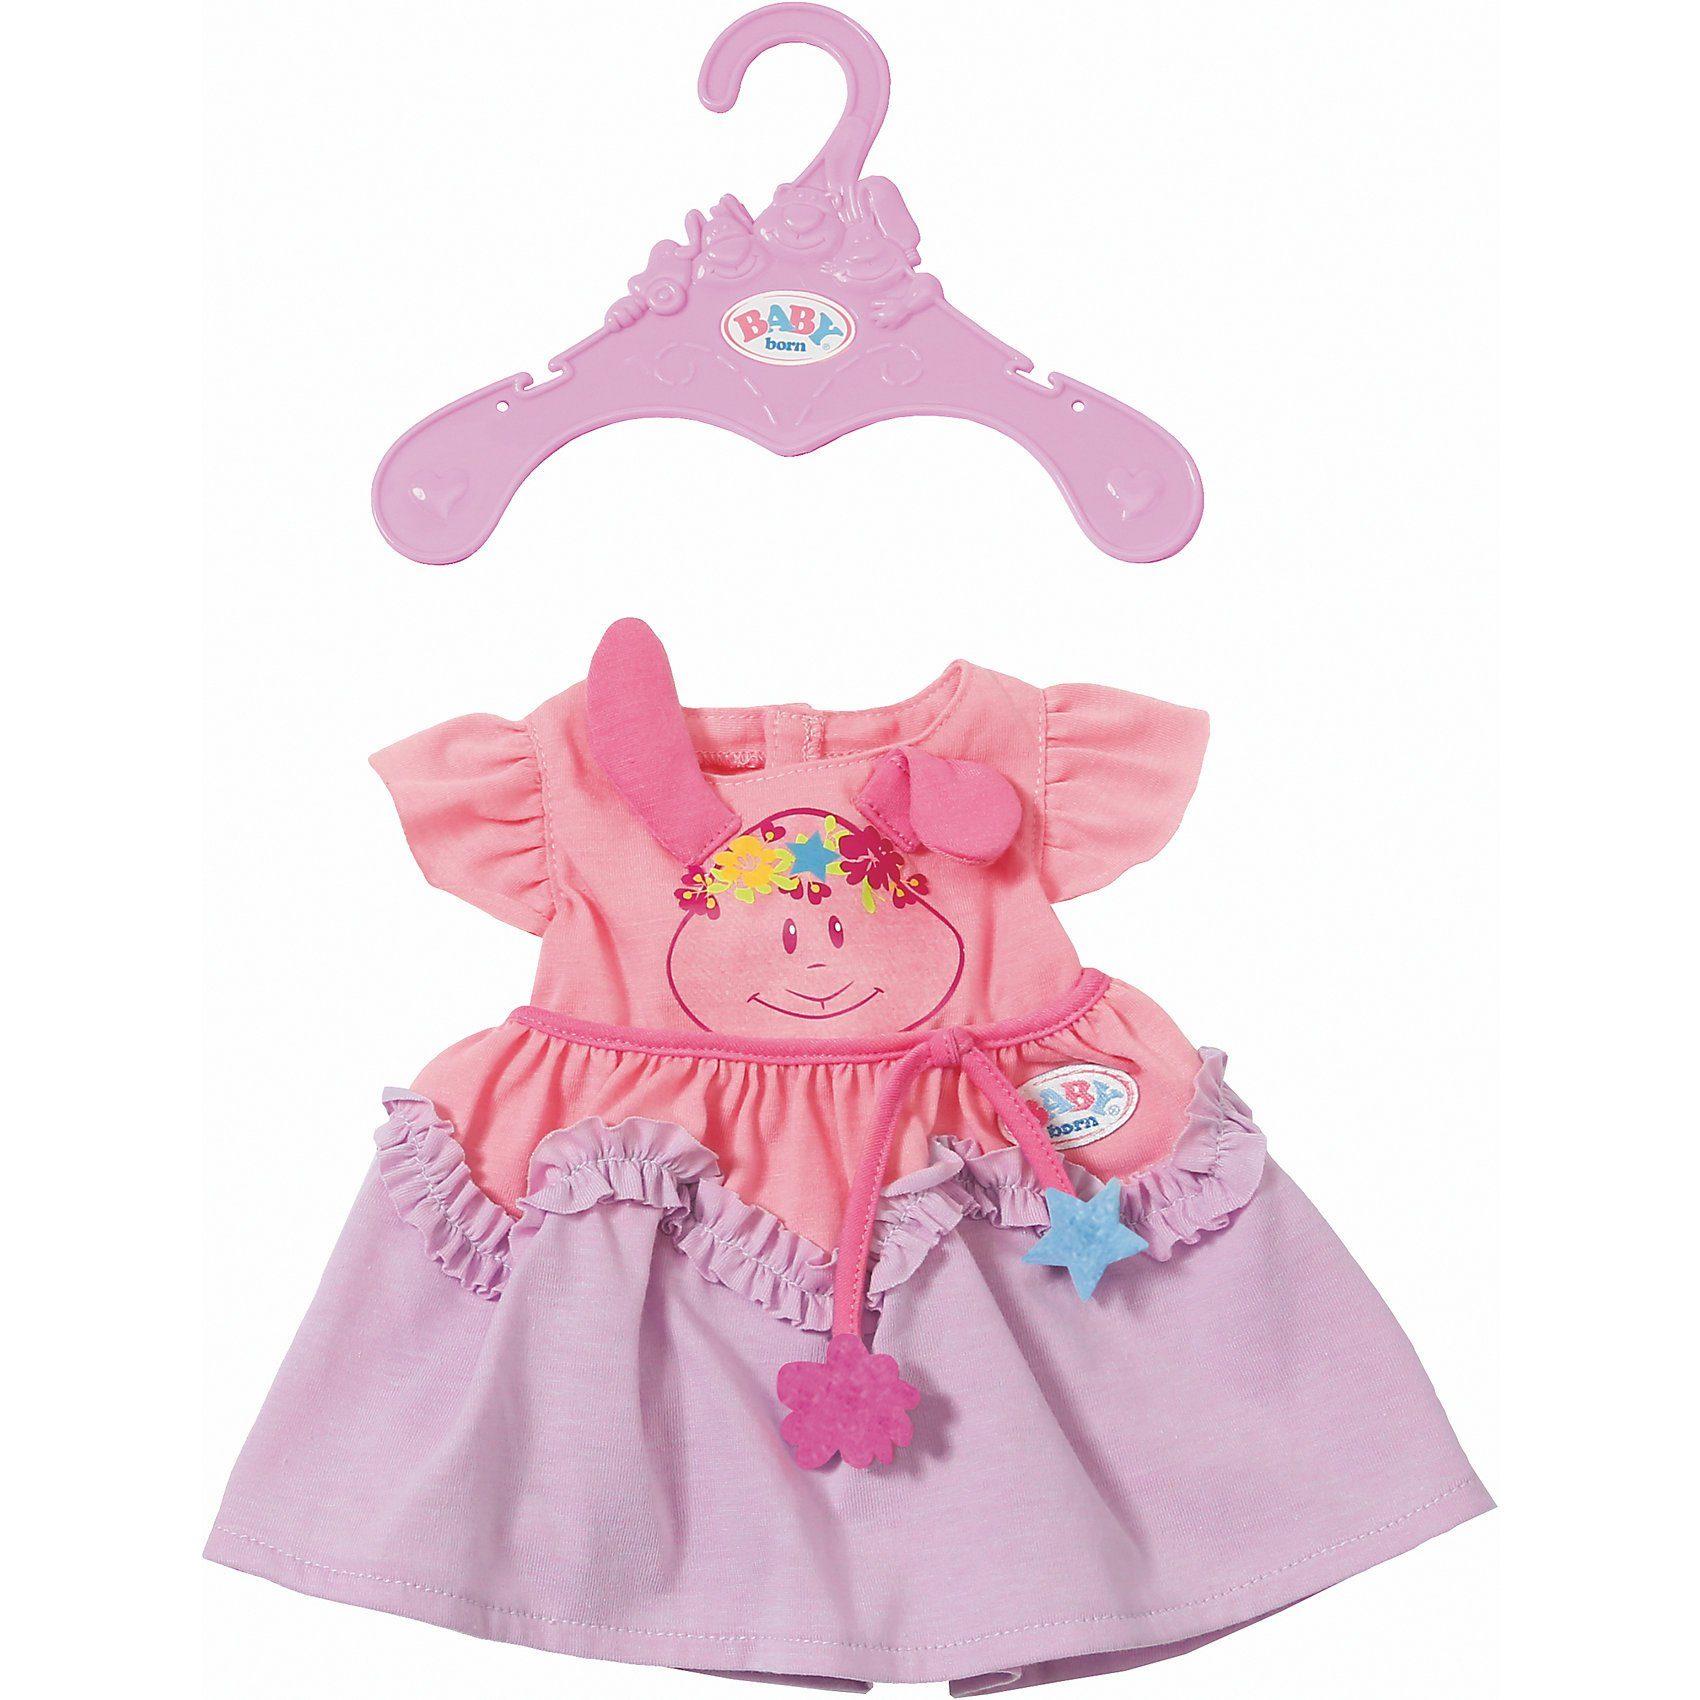 Zapf Creation® BABY born® Kleider Kollektion Lila